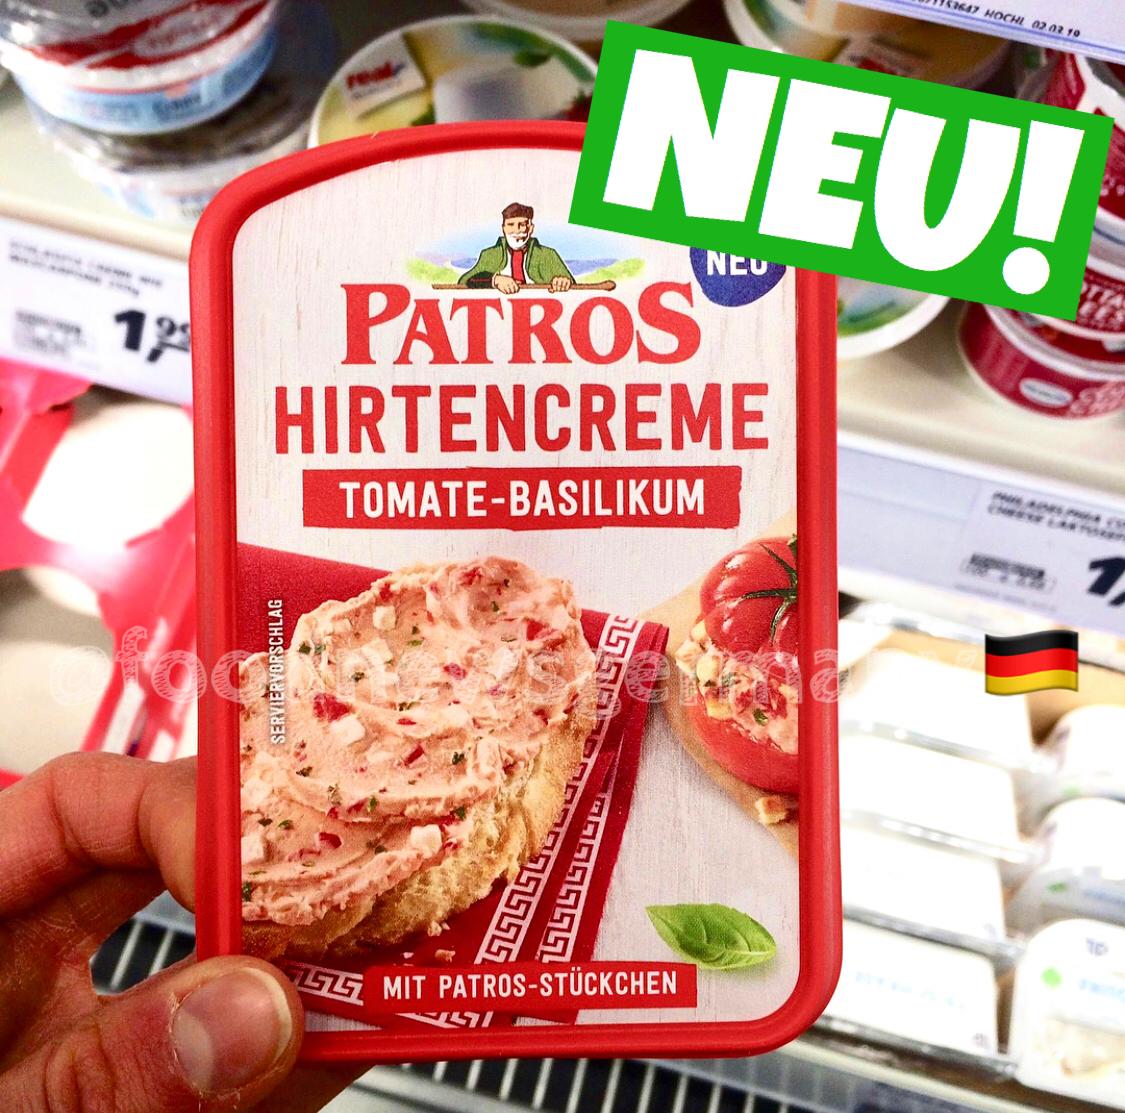 Patros Hirtencreme